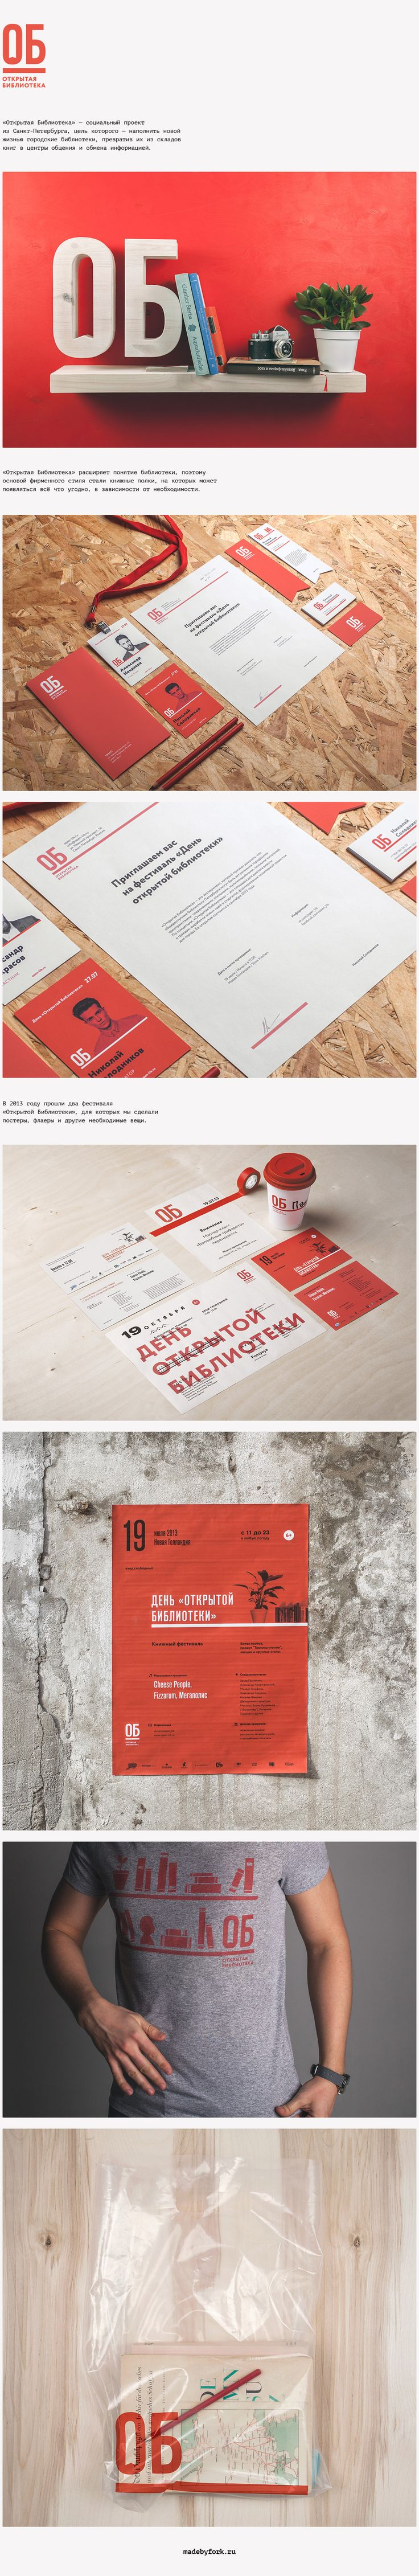 Открытая библиотека, Identity © Fork  Curated By: Transition Marketing Services | Okanagan Small Business Branding & Marketing Solutions http://www.transitionmarketing.ca